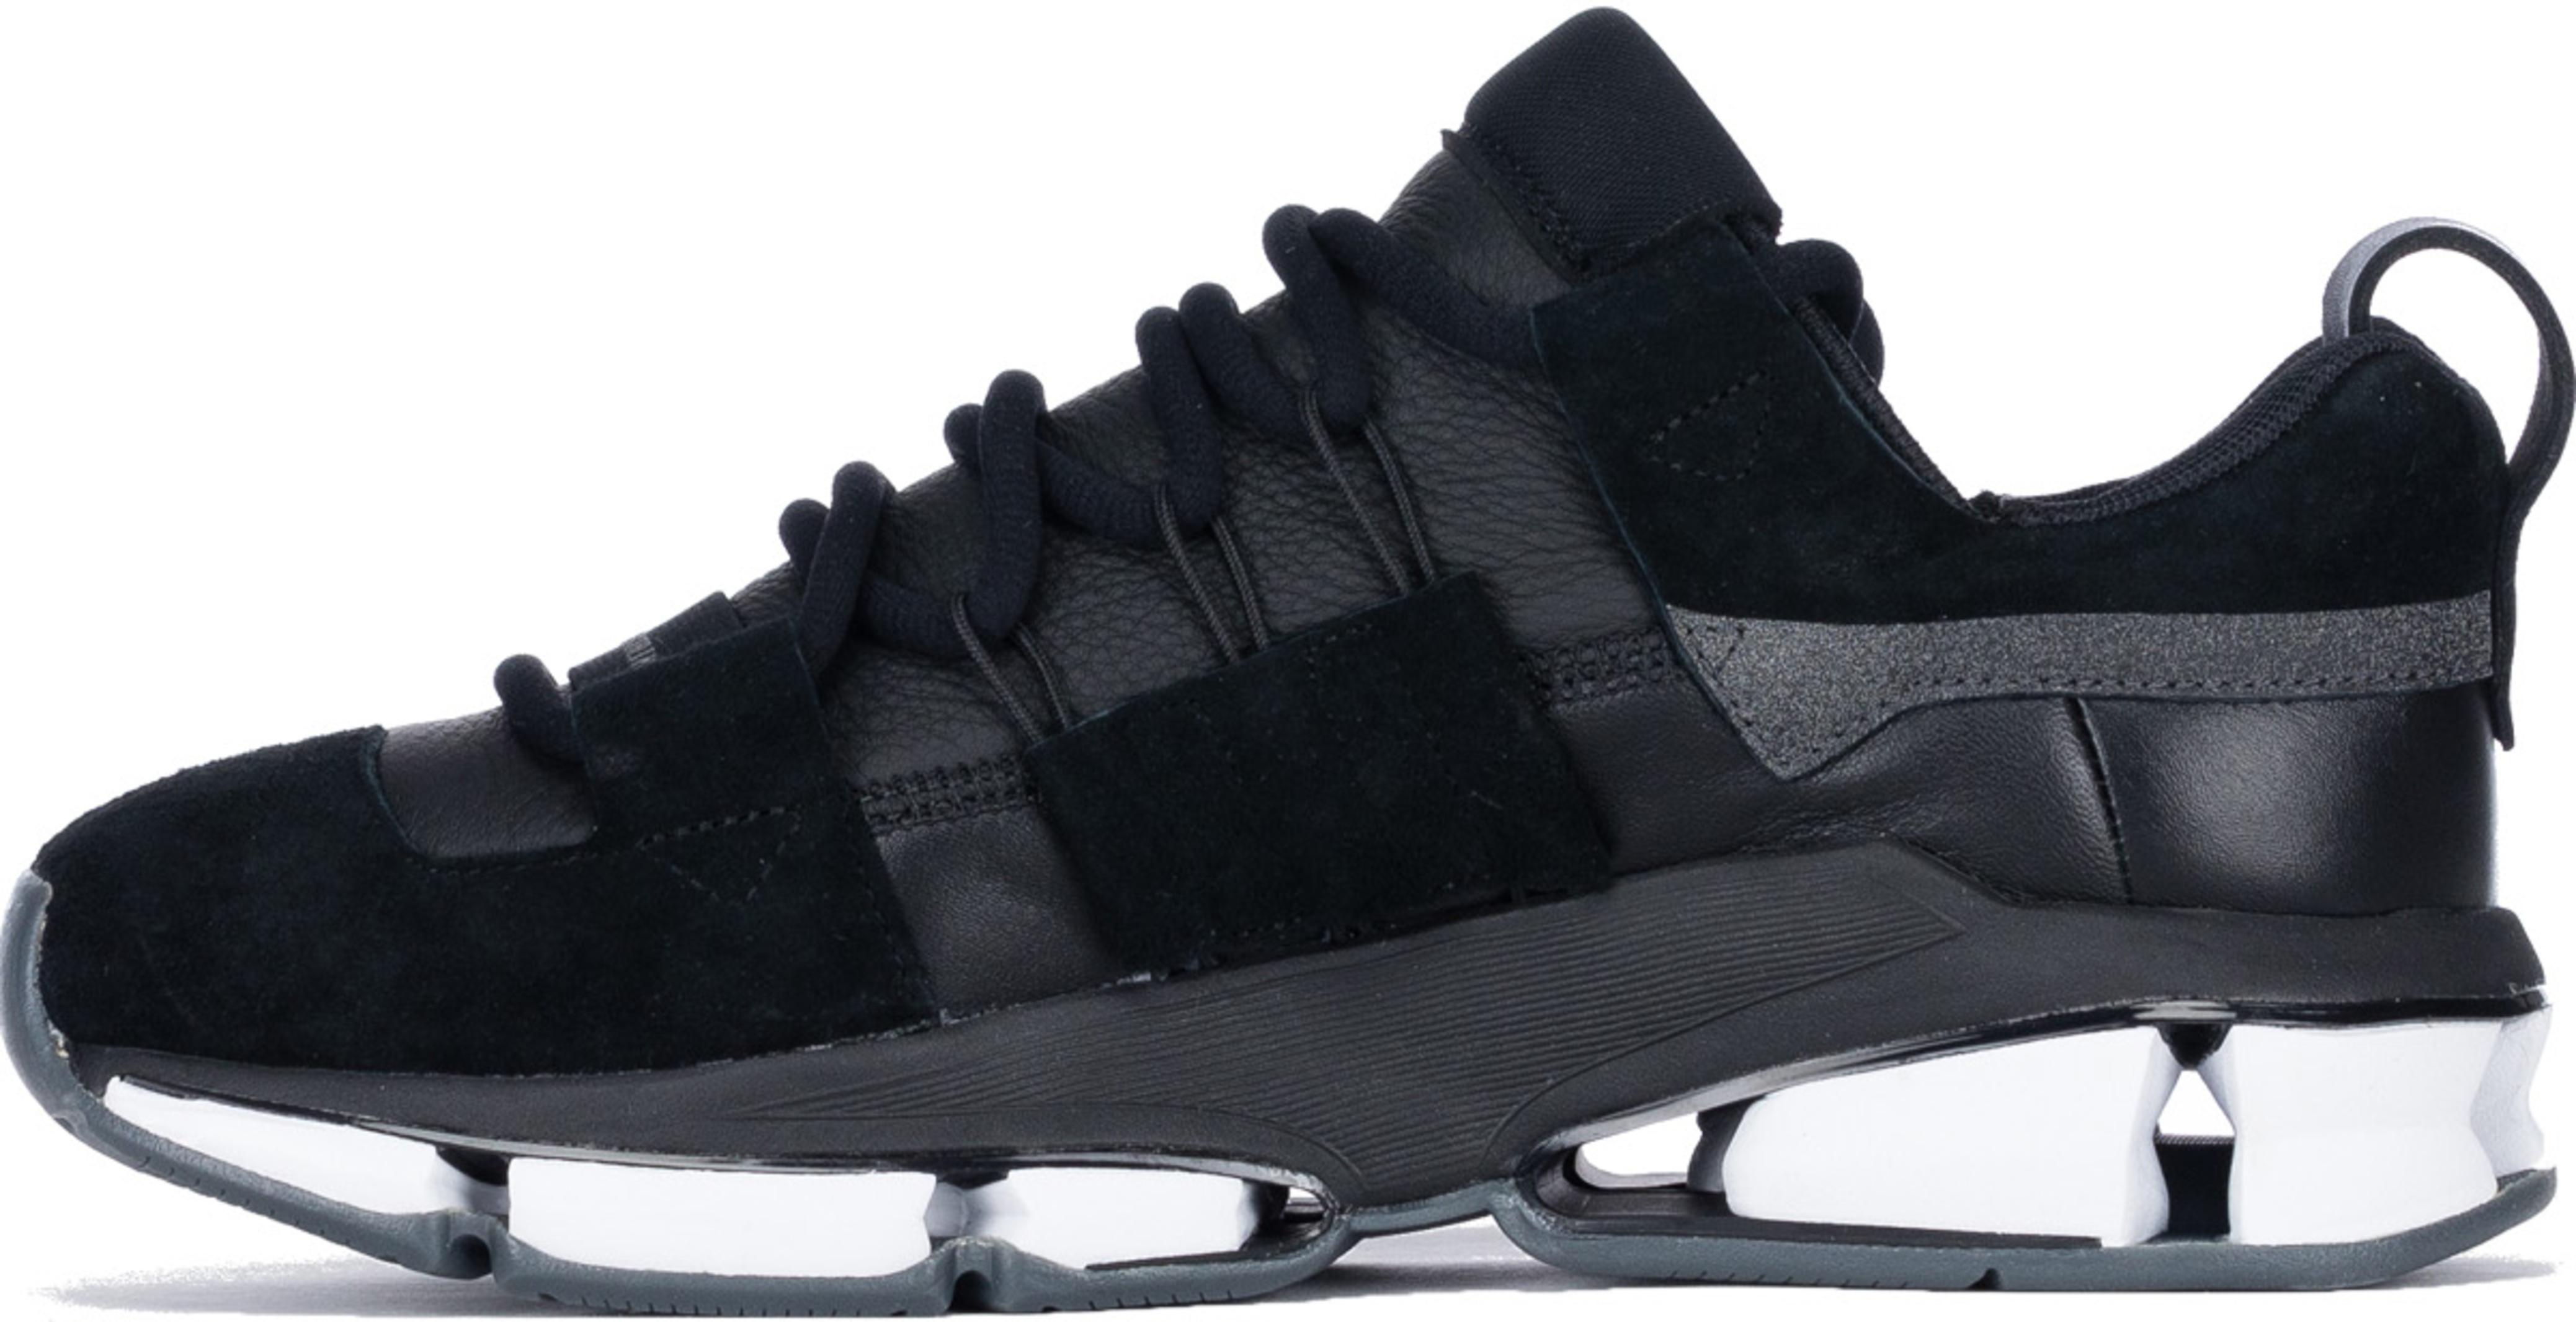 adidas Originals Twinstrike ADV Stretch Leather Core BlackFootwear WhiteCore Black